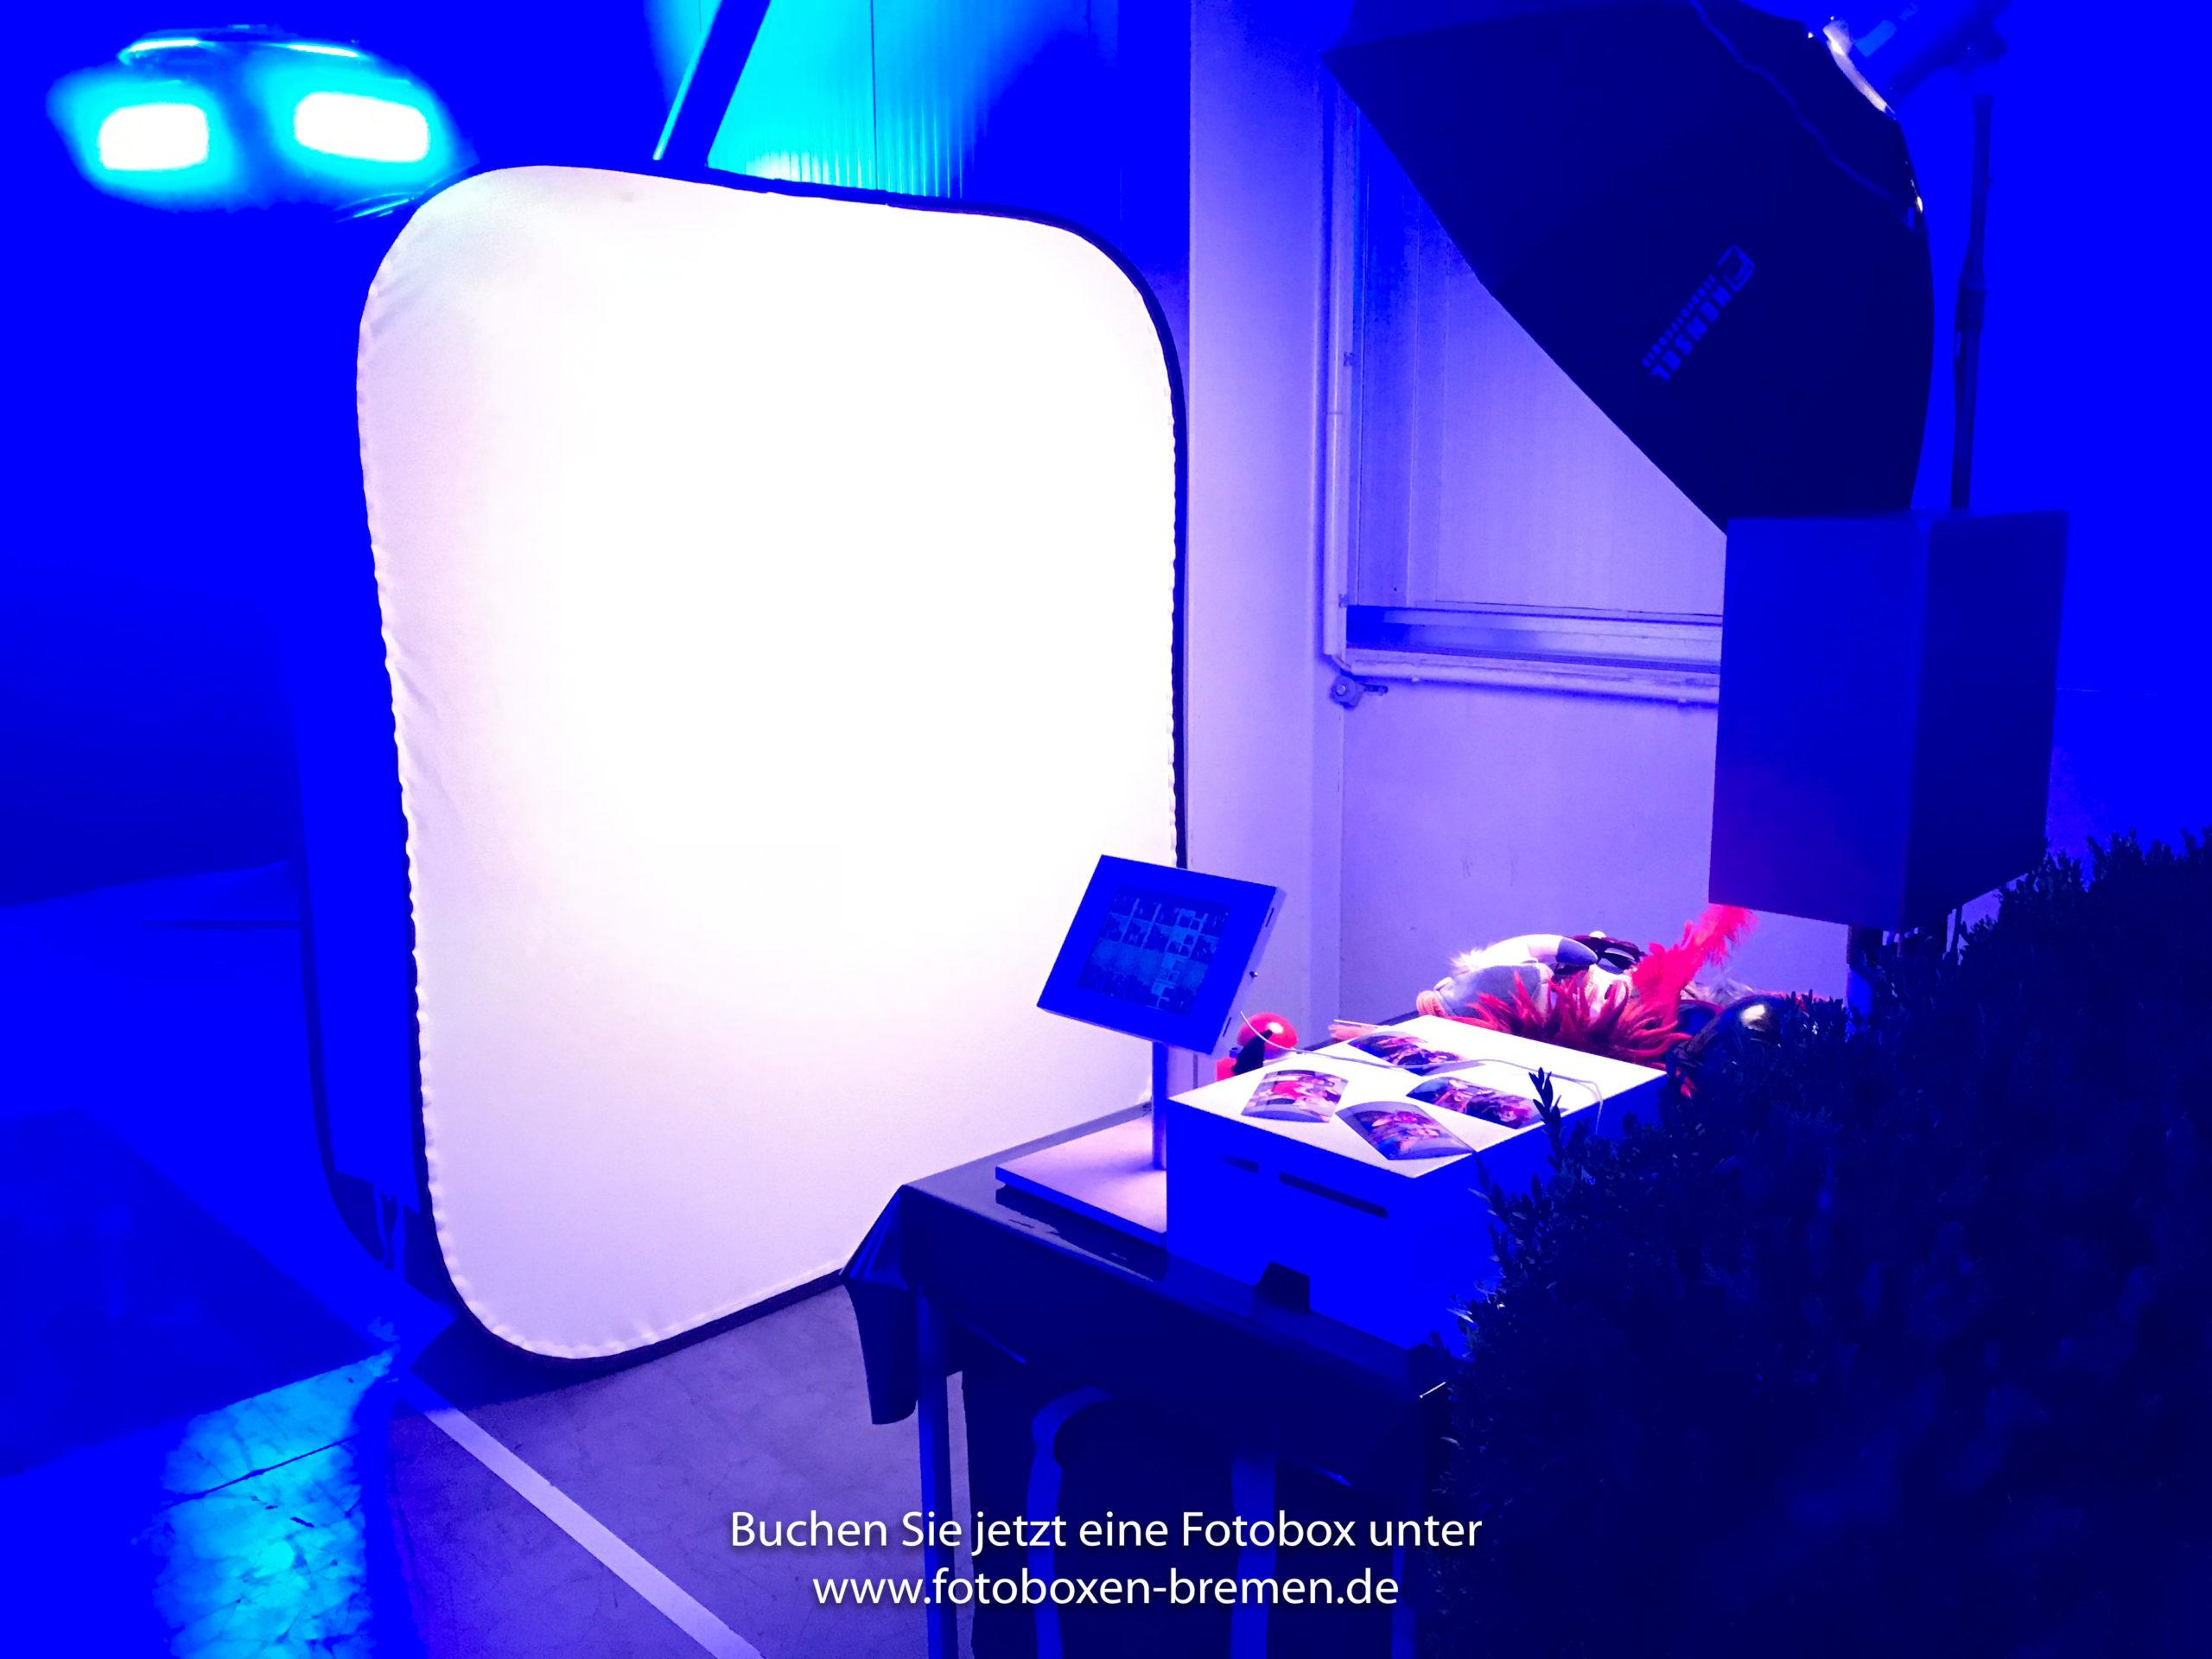 Fotobox Firmenjubiläum scaled - Fotobox Bremen mieten